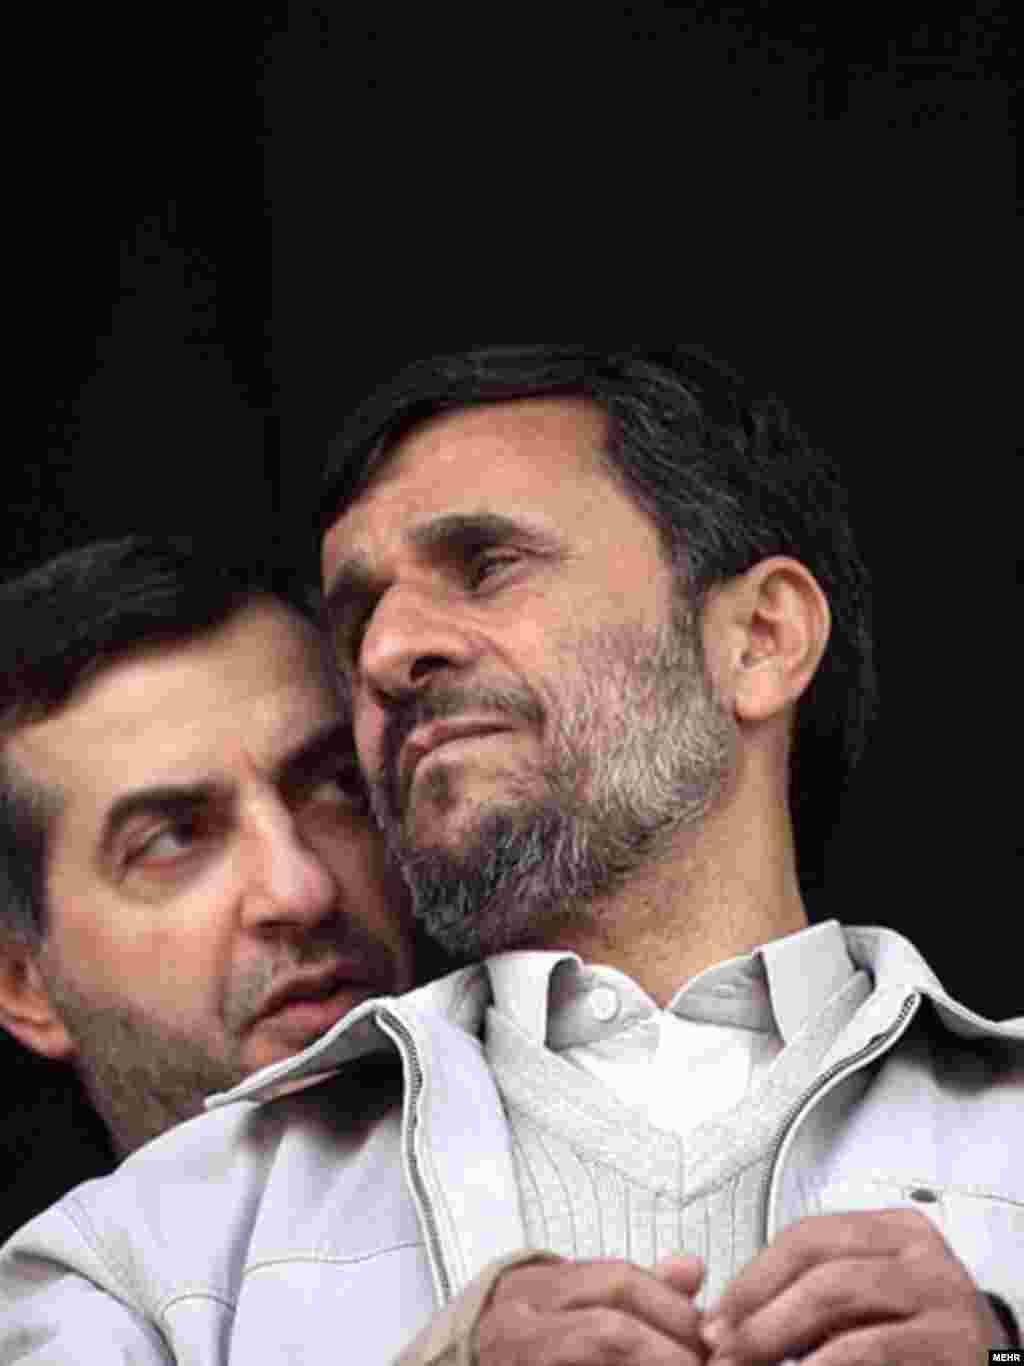 Iran -- Esfandiar Rahim-Mashaei; Iran's vice president (L) & Iranian president Mahmud Ahmadinejad, undated